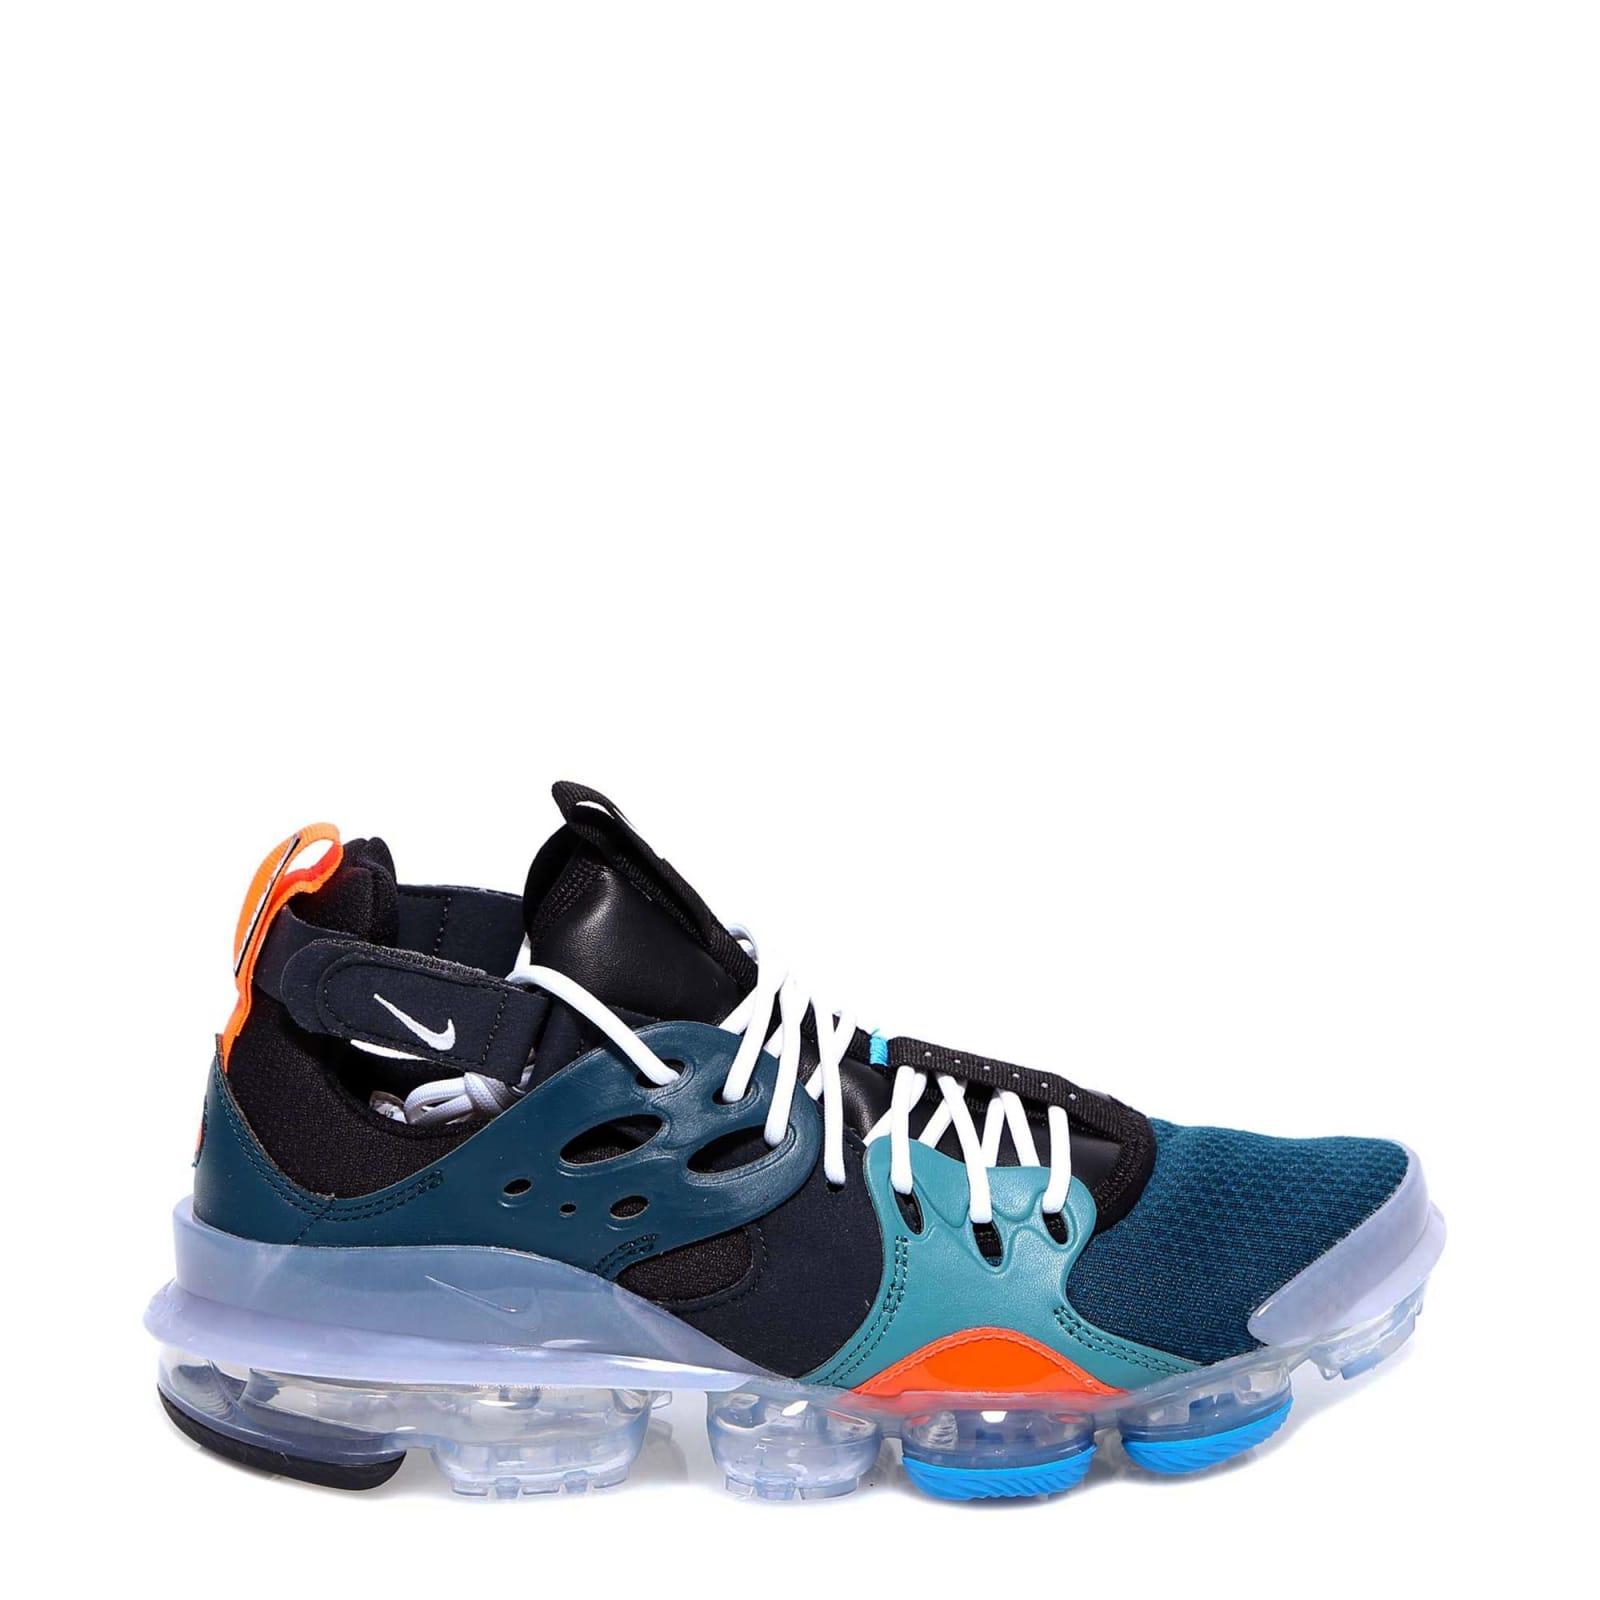 Nike Air Adsvm Sneakers